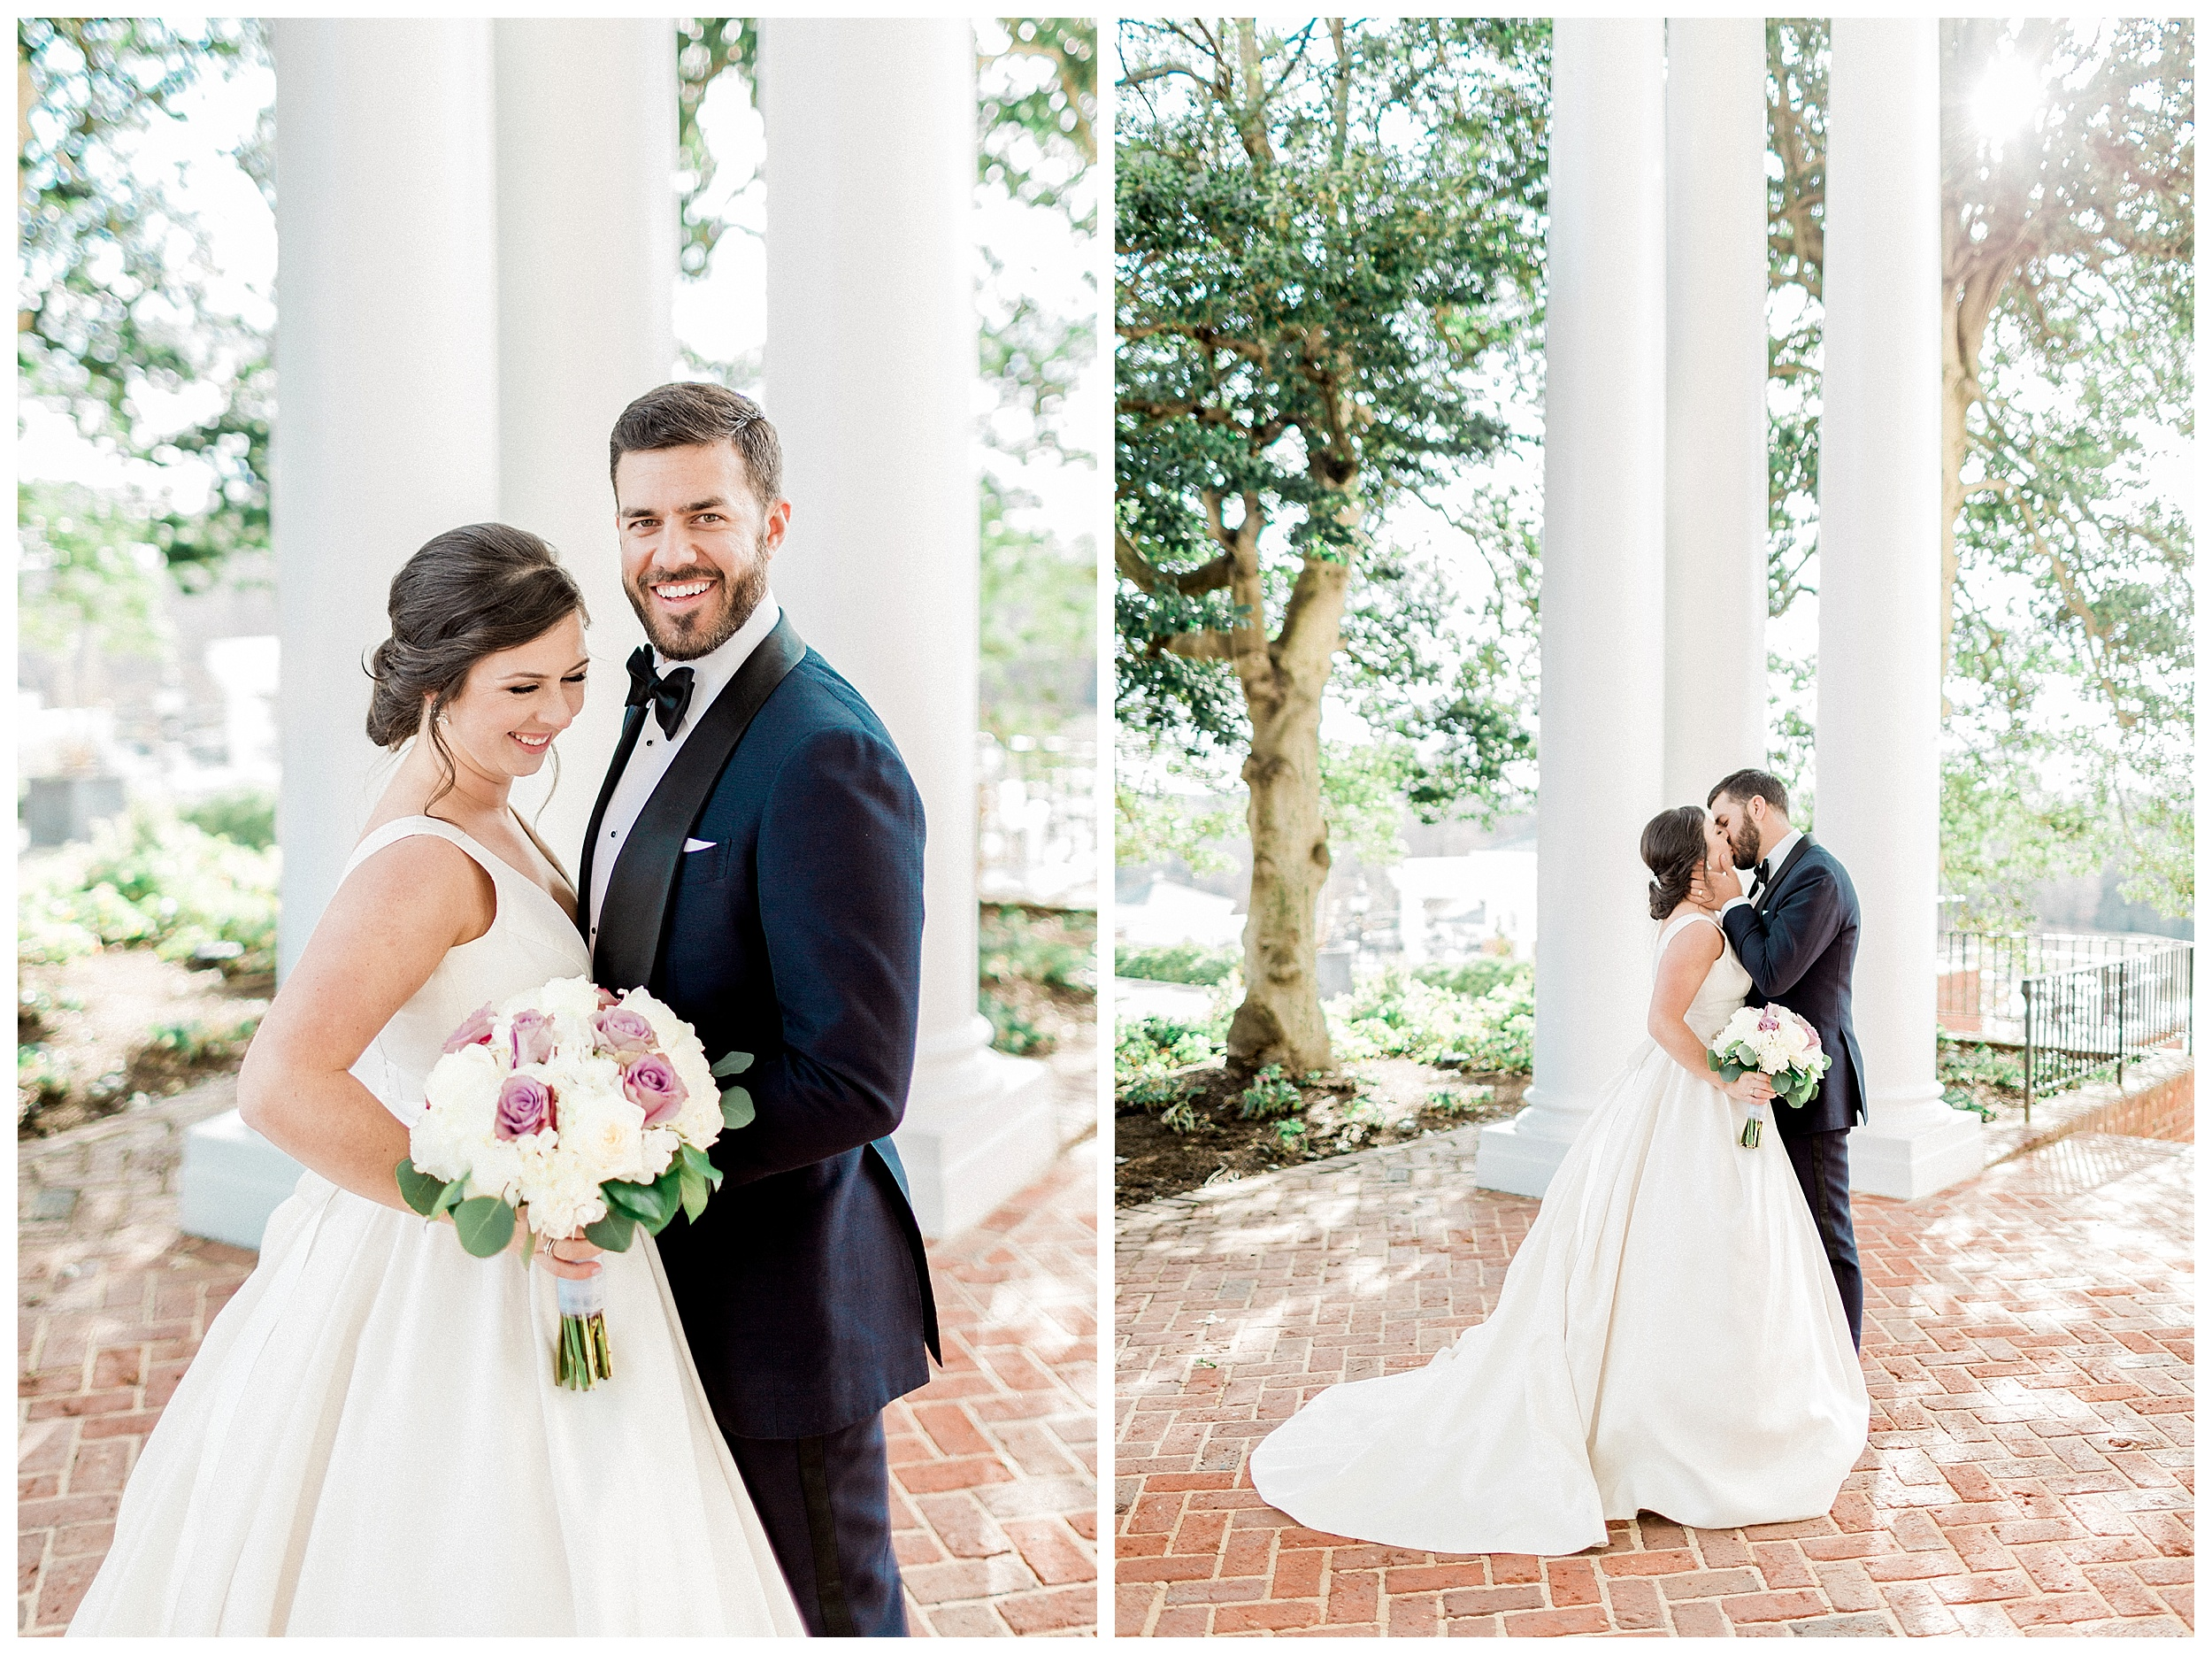 Country Club of Virginia Wedding | Richmond Wedding Photographer_0117.jpg